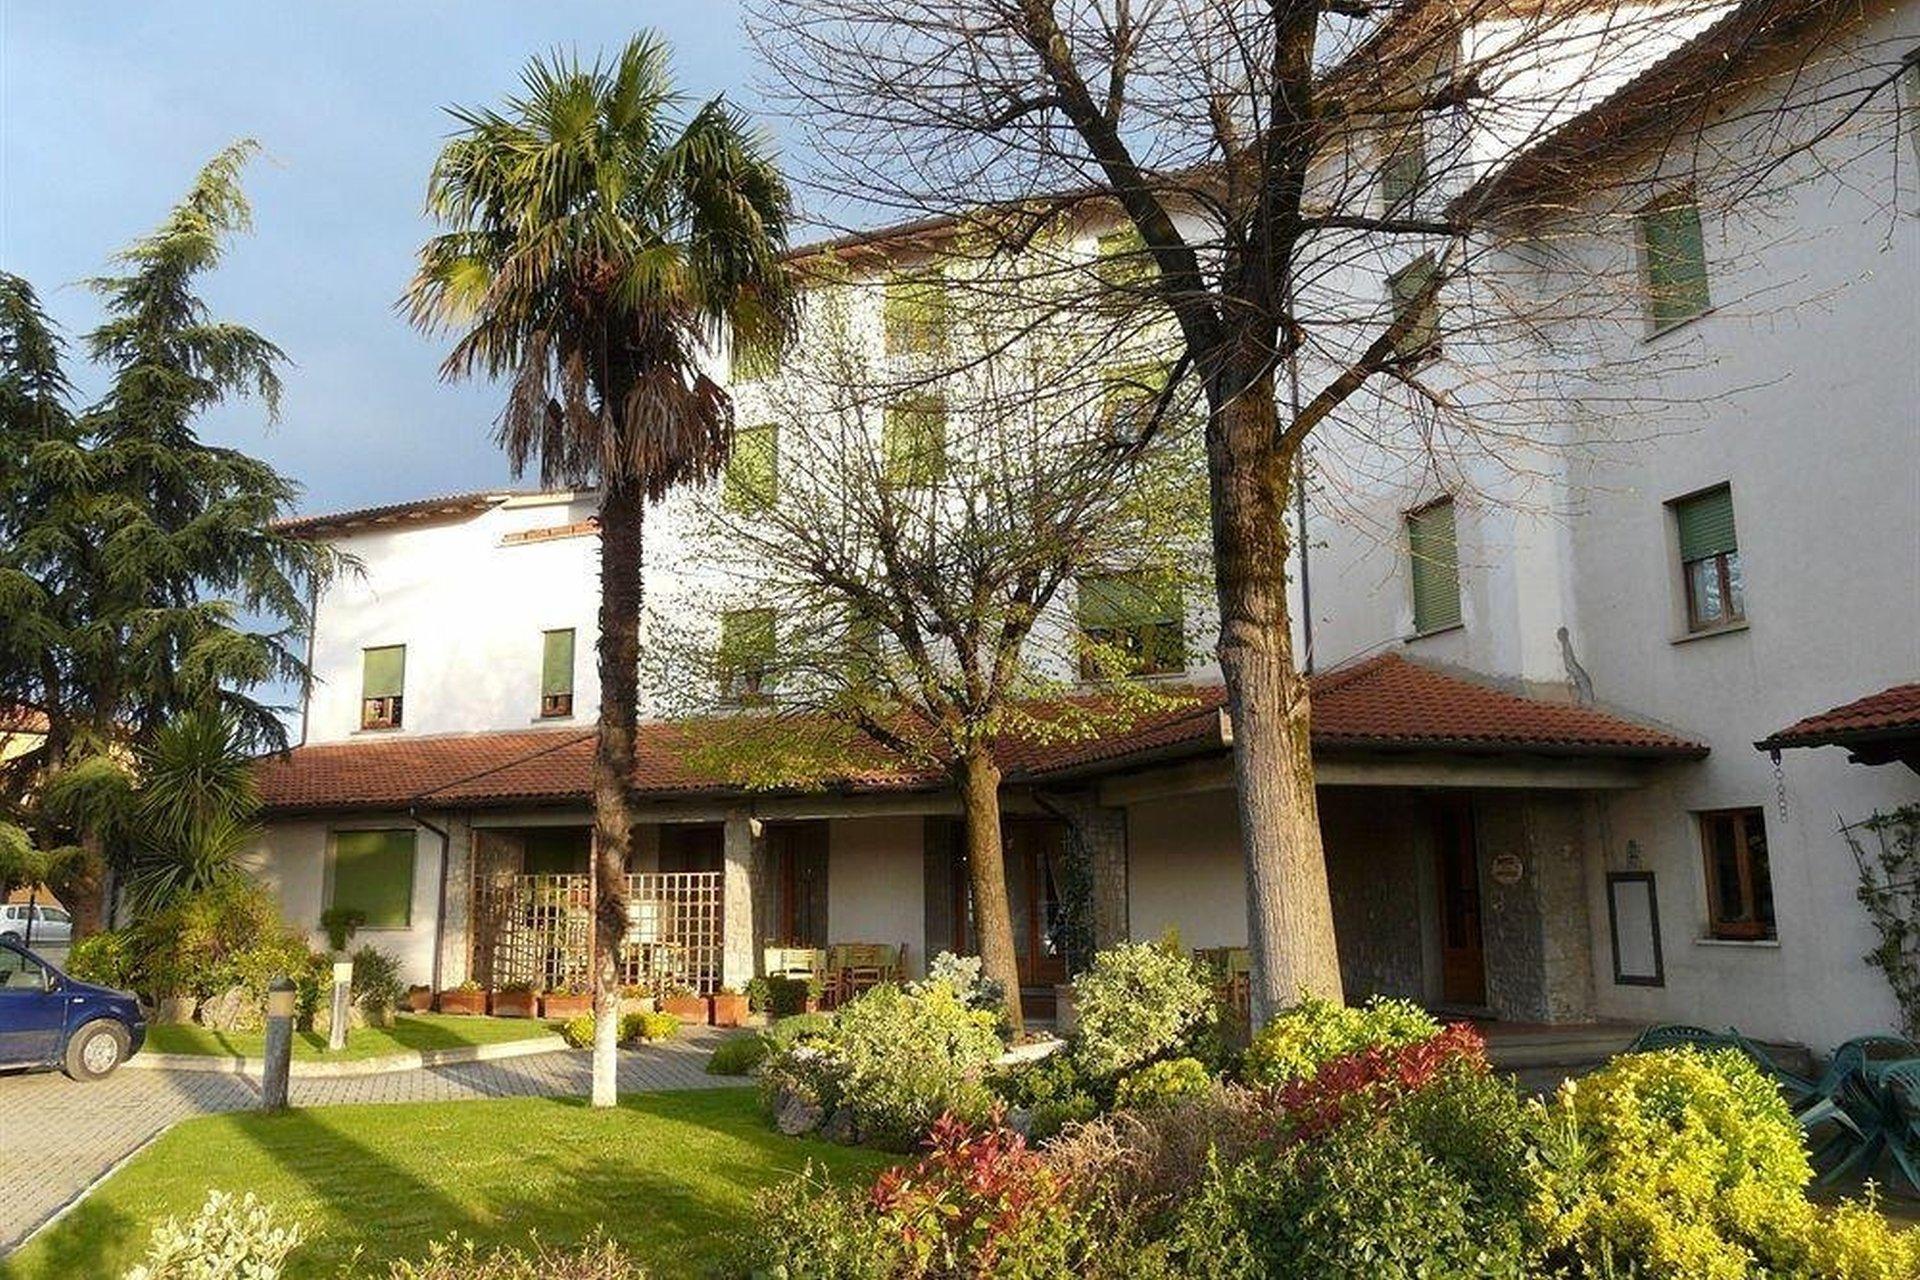 Hotel-La-Piccola-Stazione-photos-Exterior